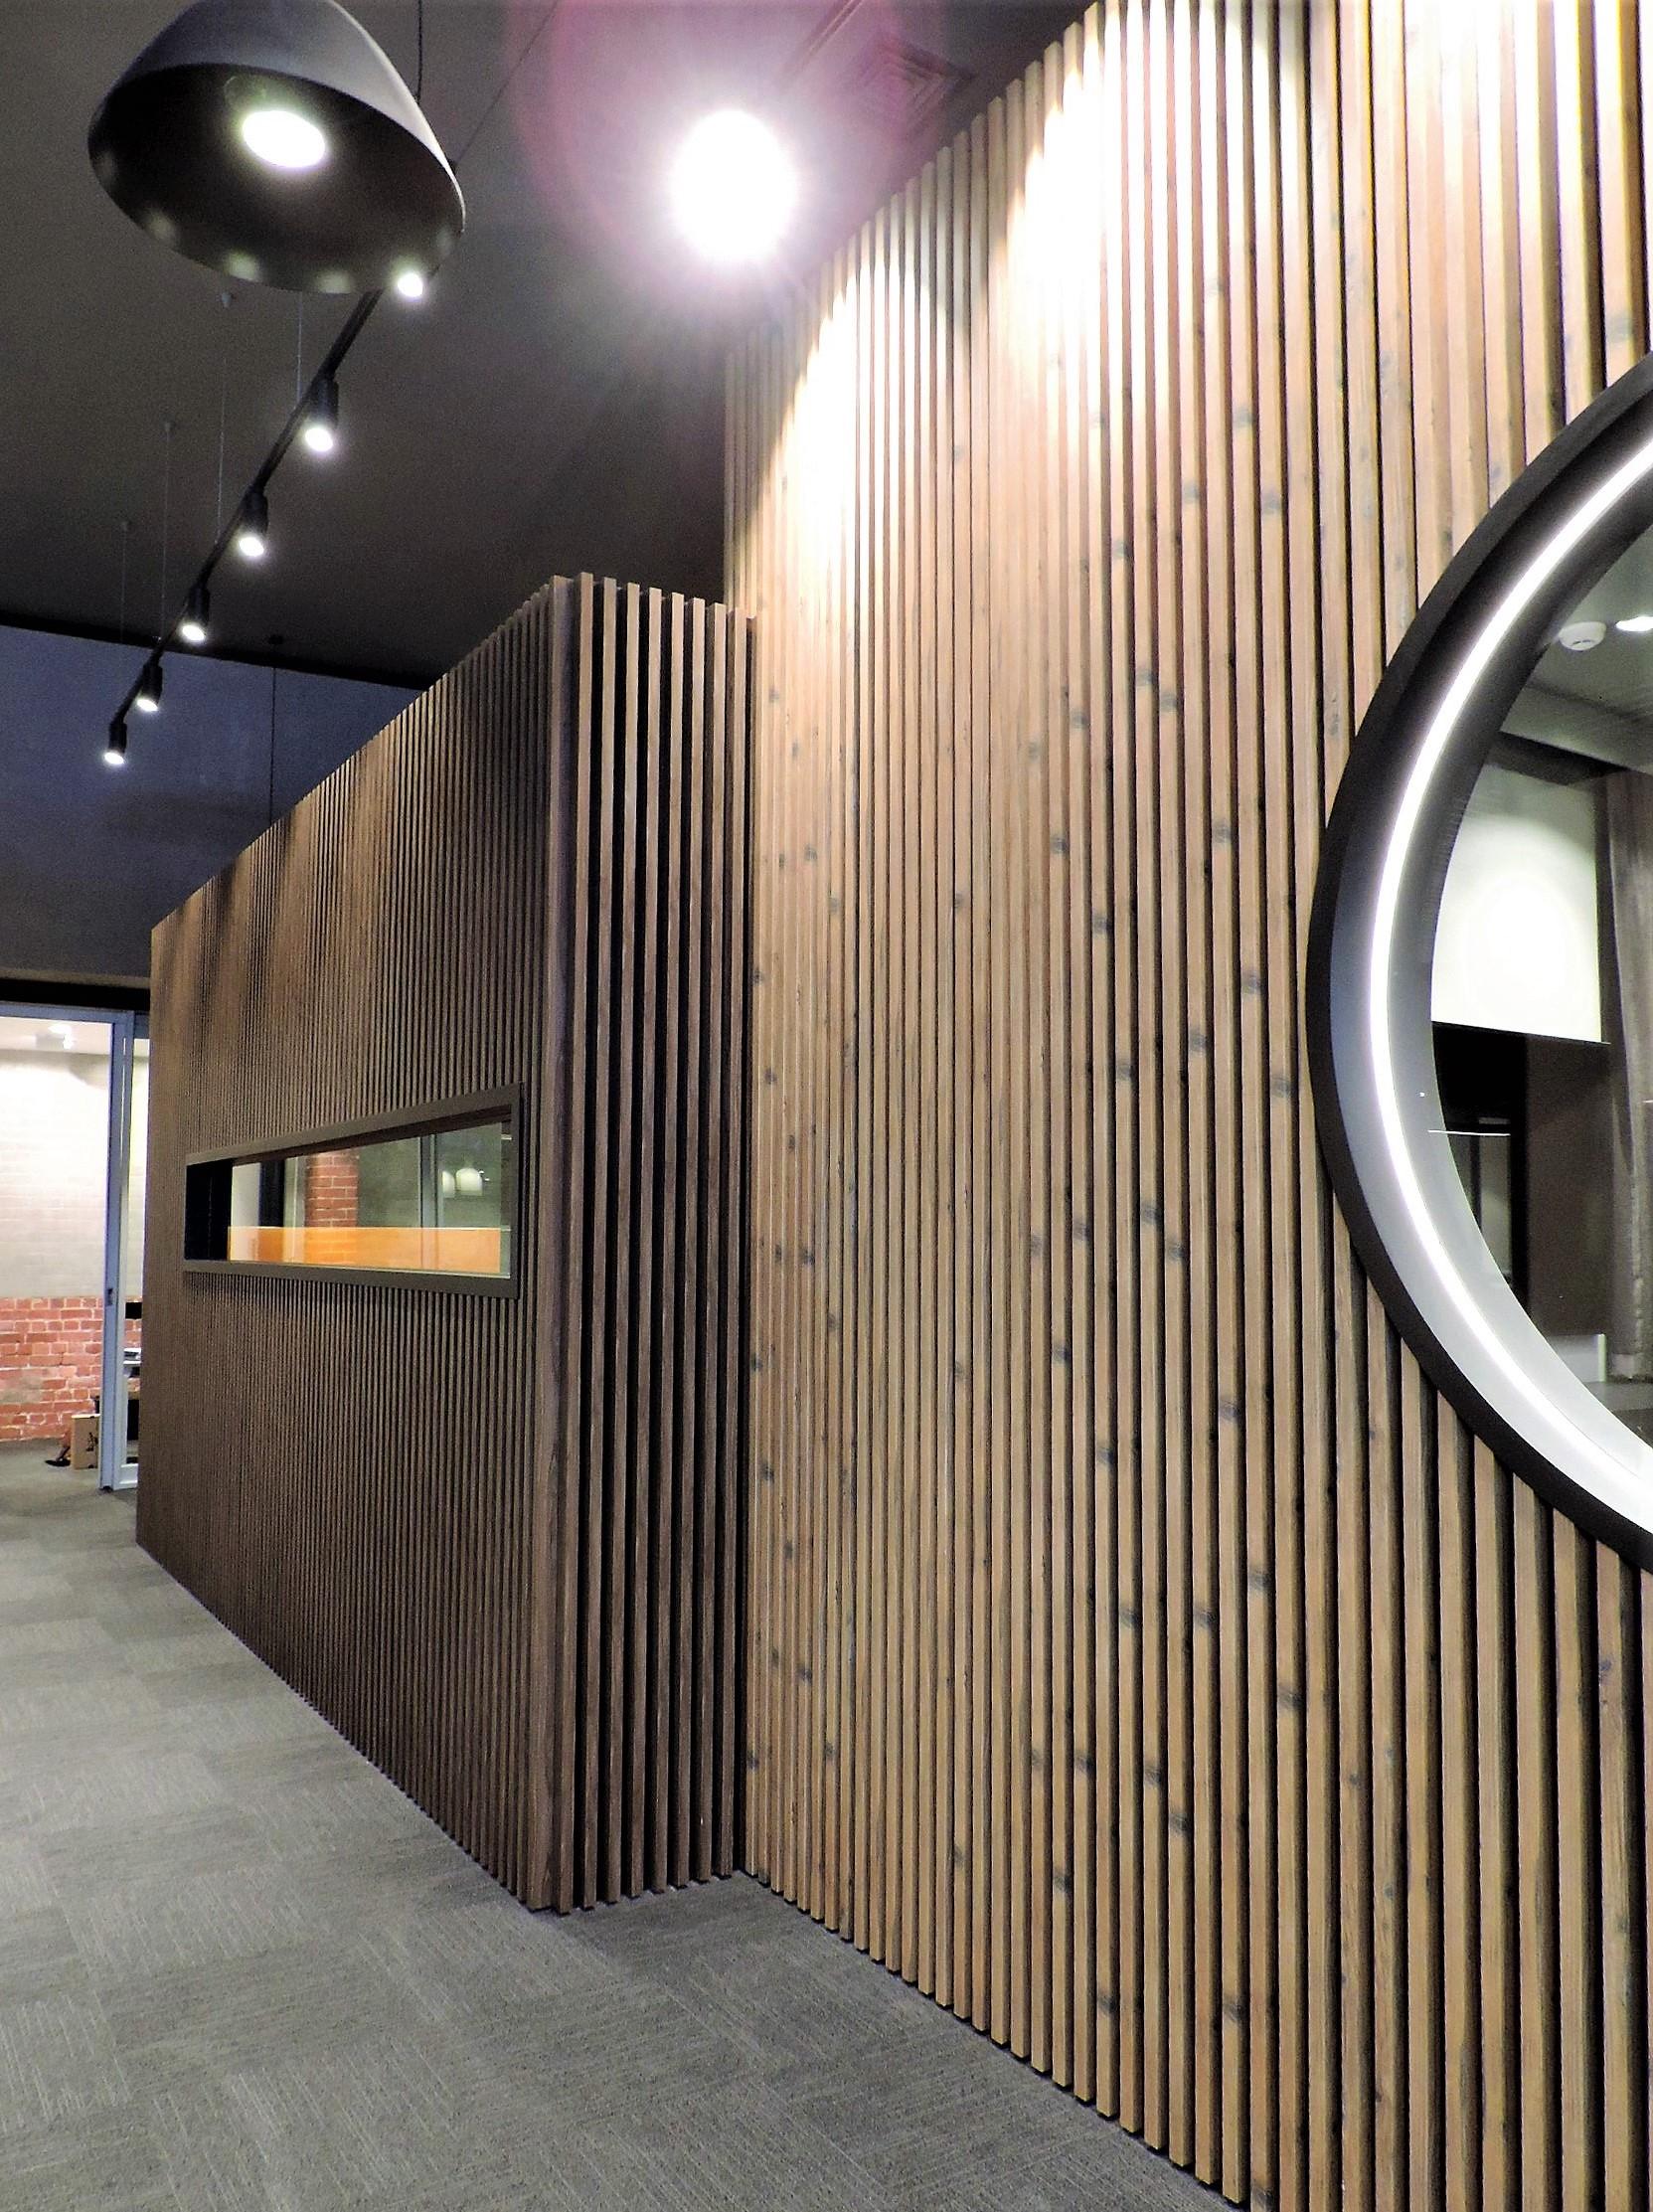 Timber look alulminium Covet 3 - Copy - Copy.JPG